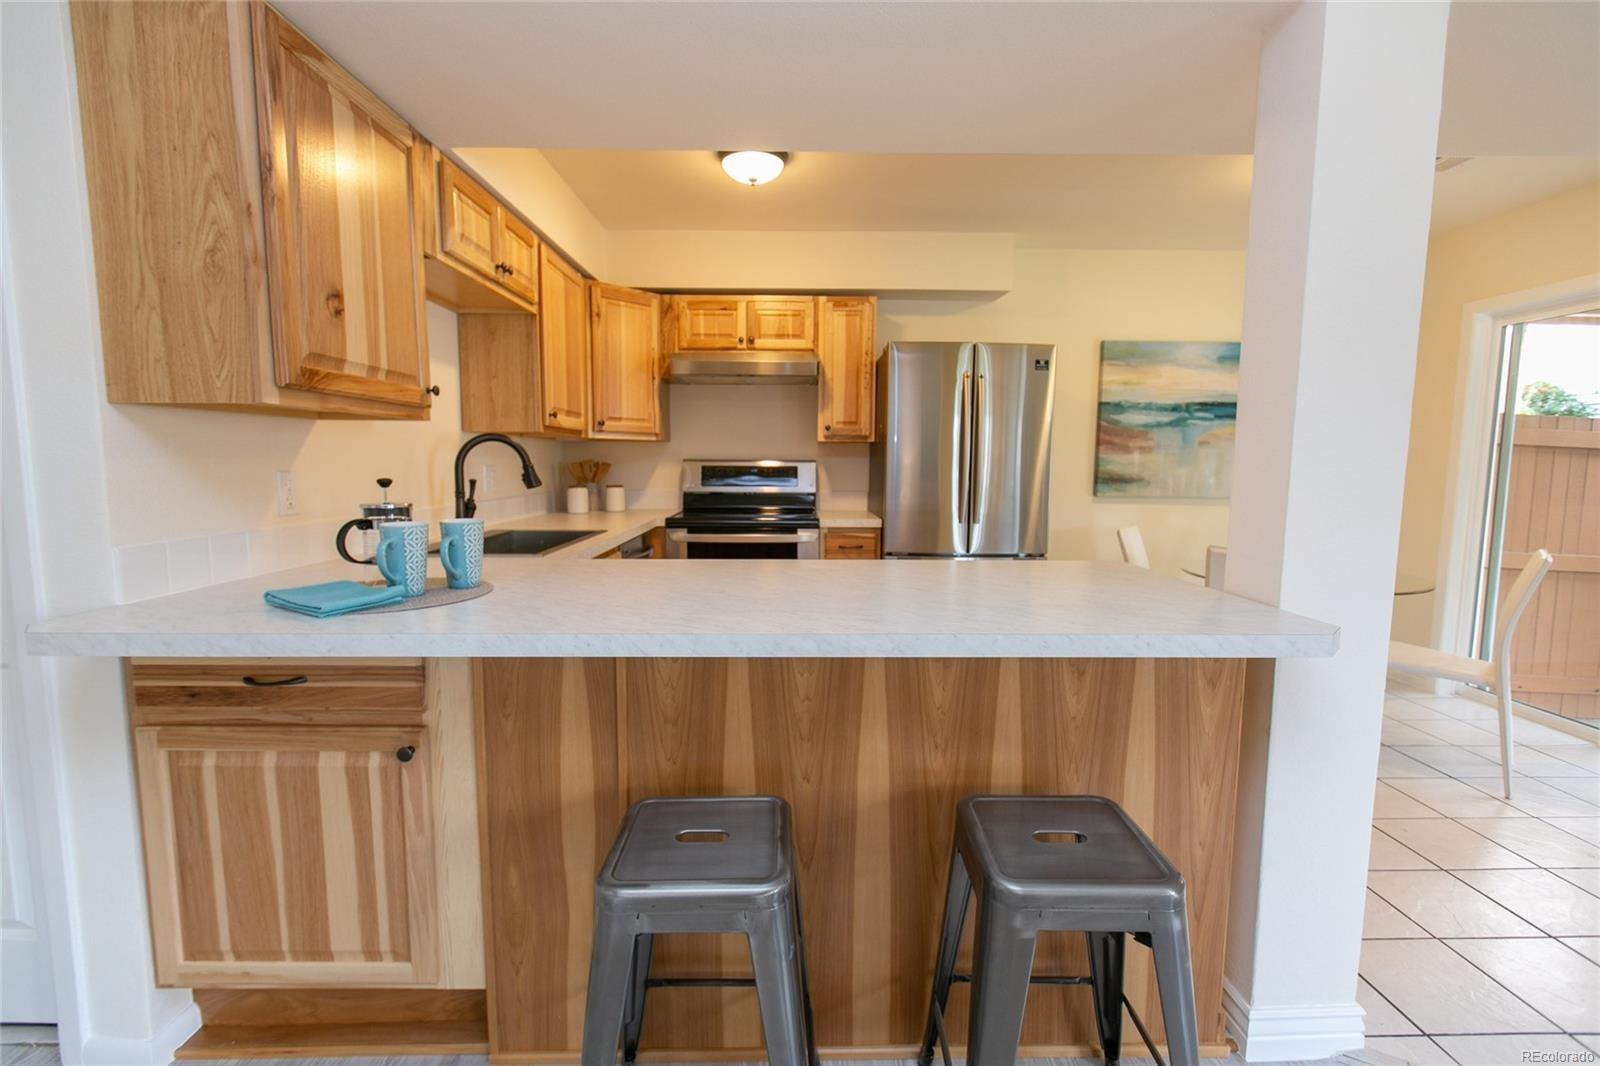 MLS# 4292489 - 4 - 3630 Iris Avenue #B, Boulder, CO 80301